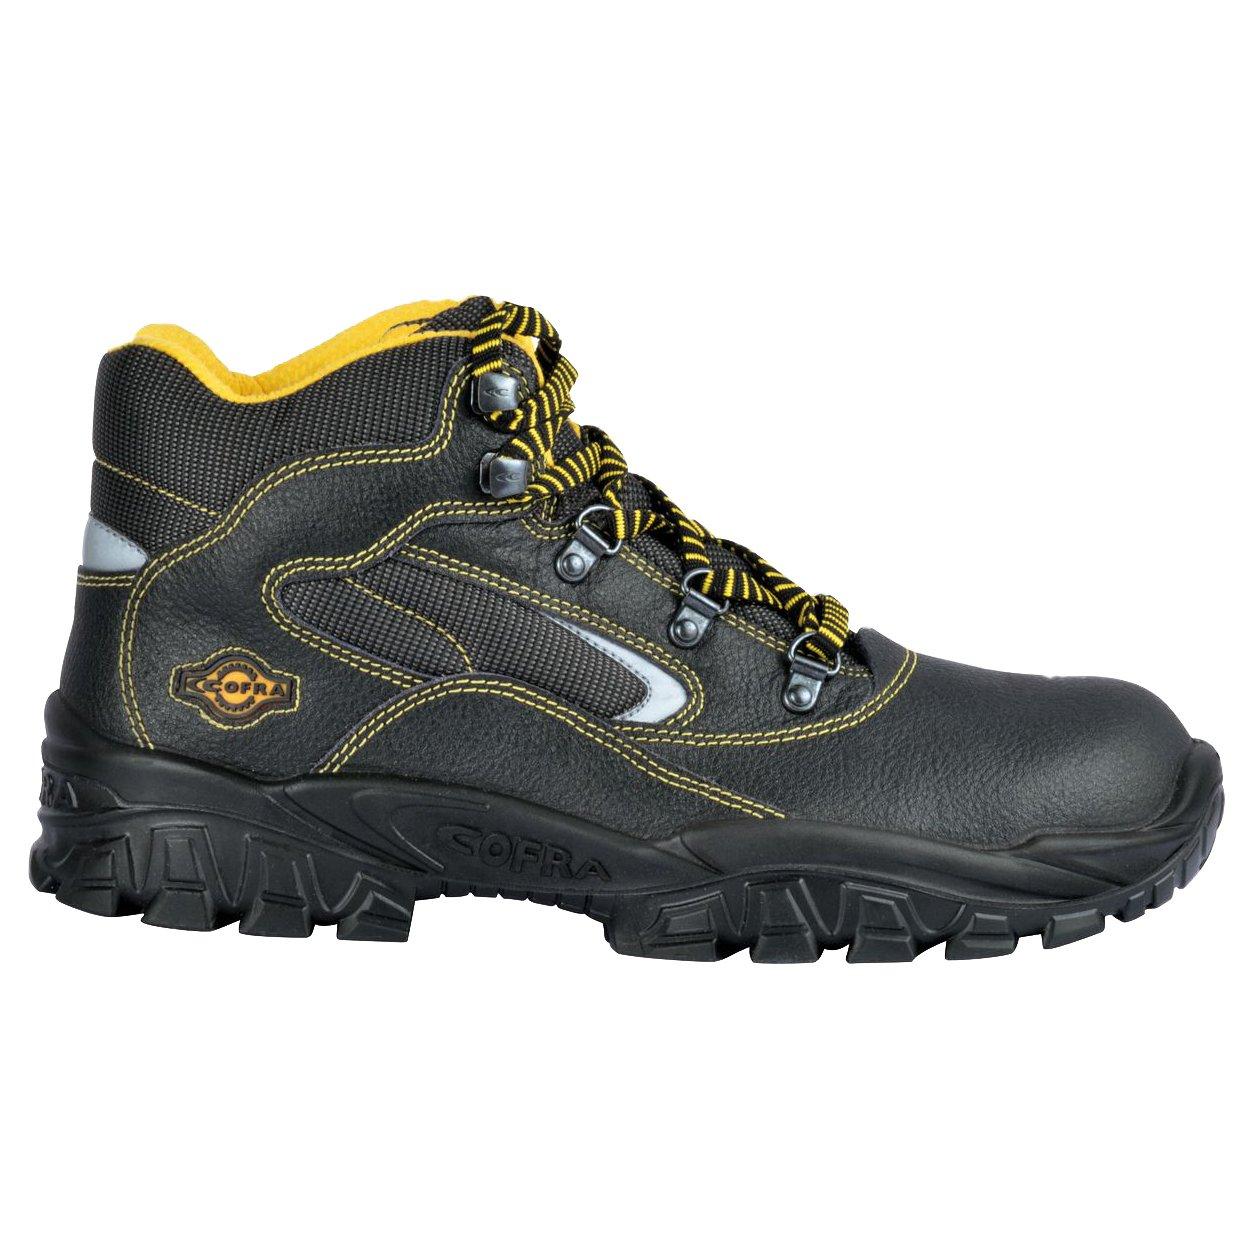 Cofra NEW Eufrate S3/SRC par de zapatos de seguridad talla 36/NEGRO